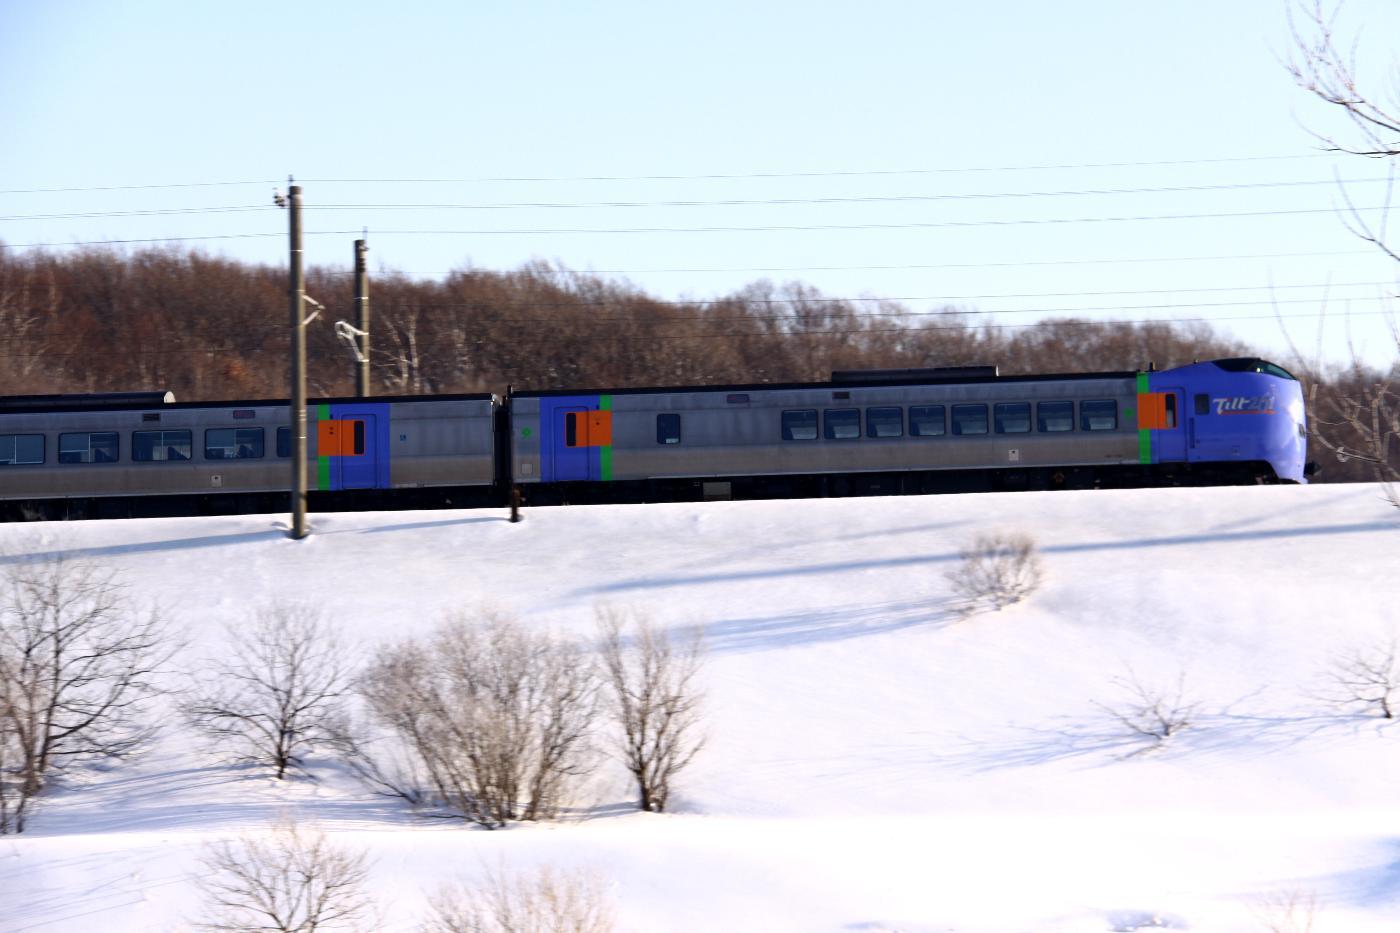 Jr130211201